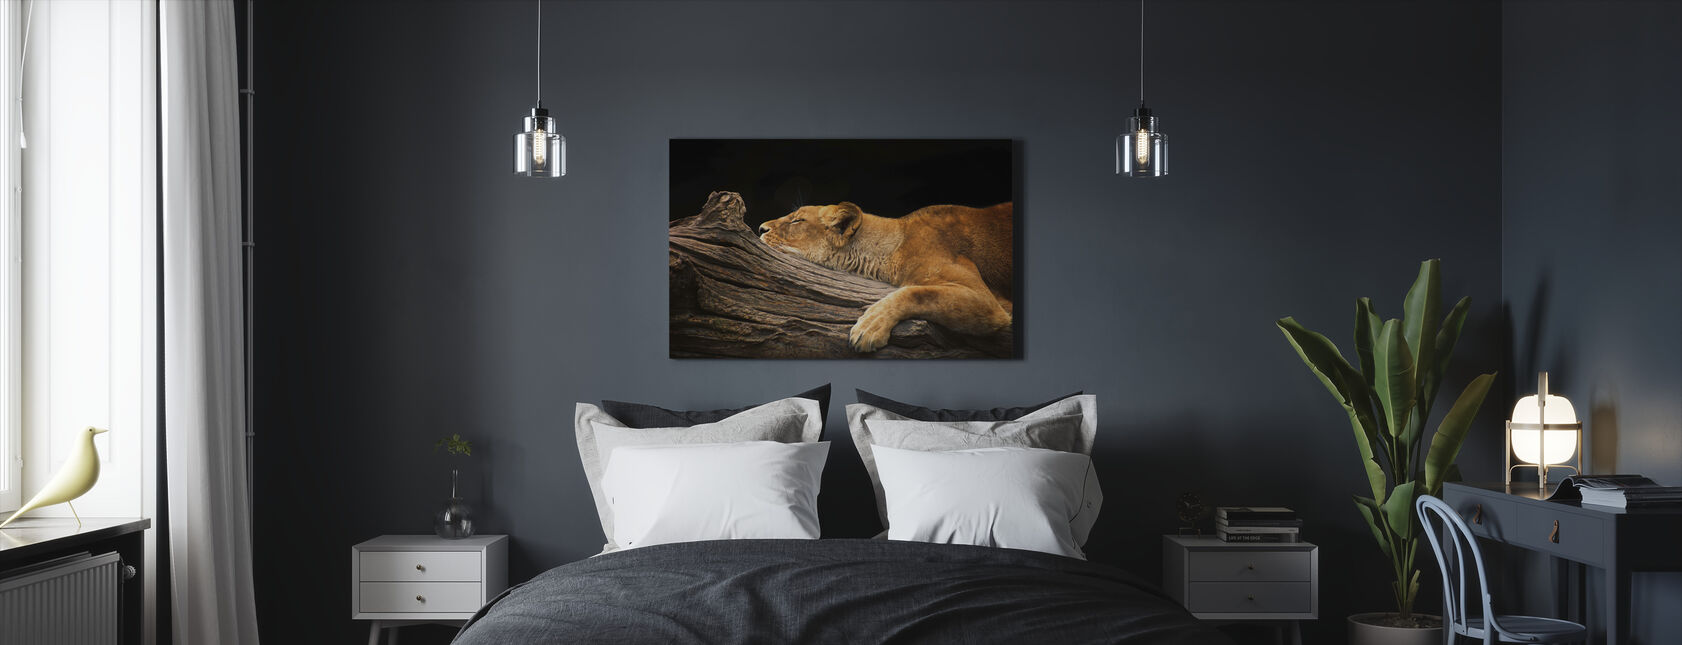 Løve på logg - Lerretsbilde - Soverom